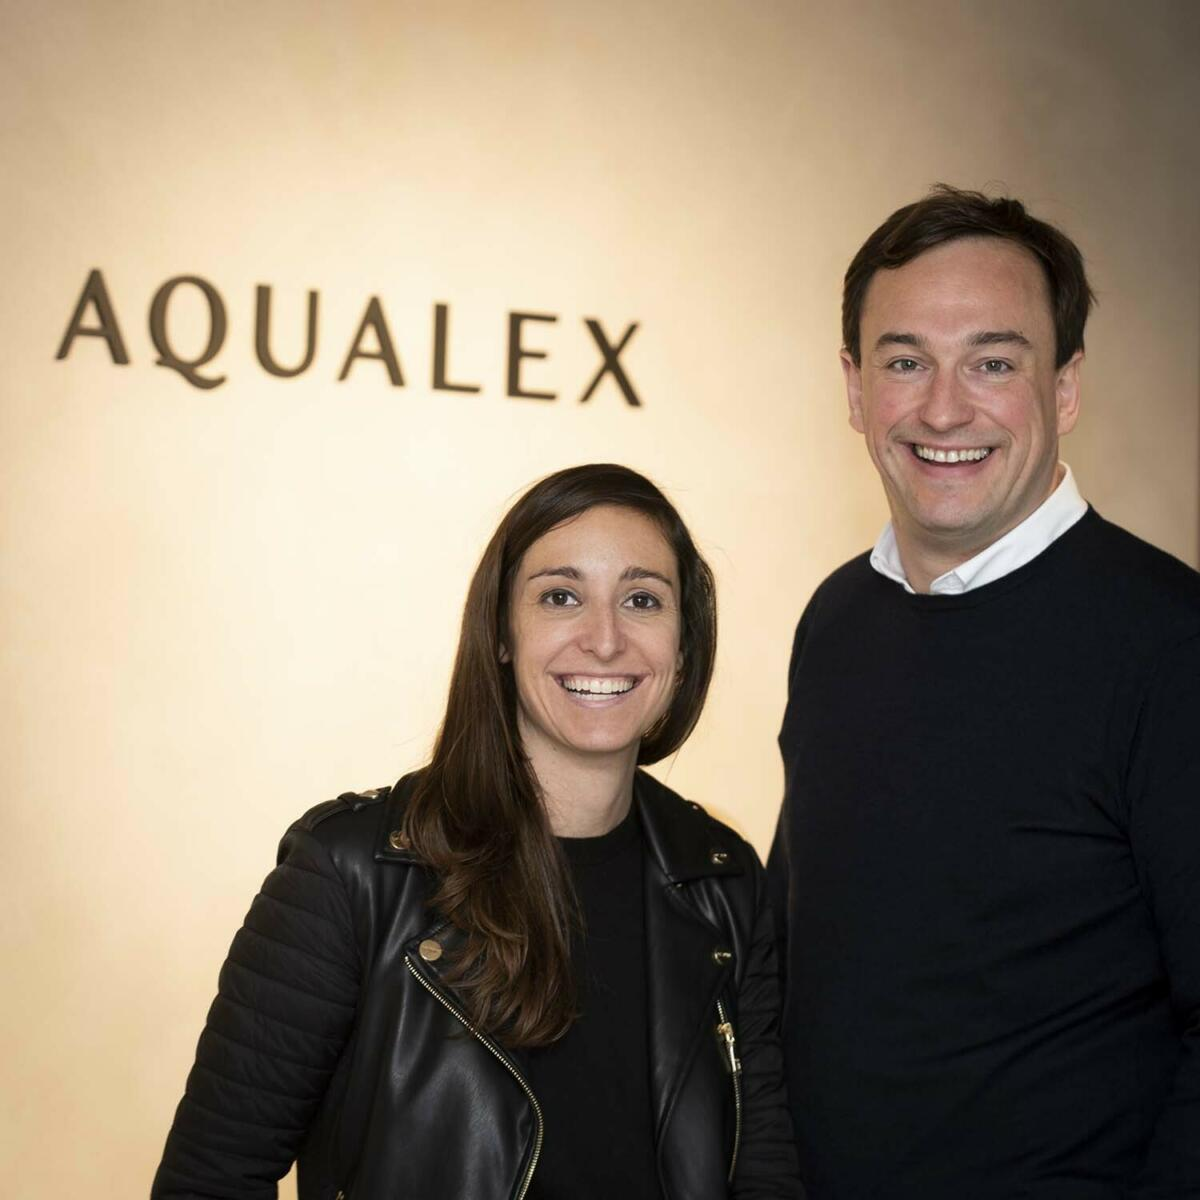 AQUALEX Niki en Alexander